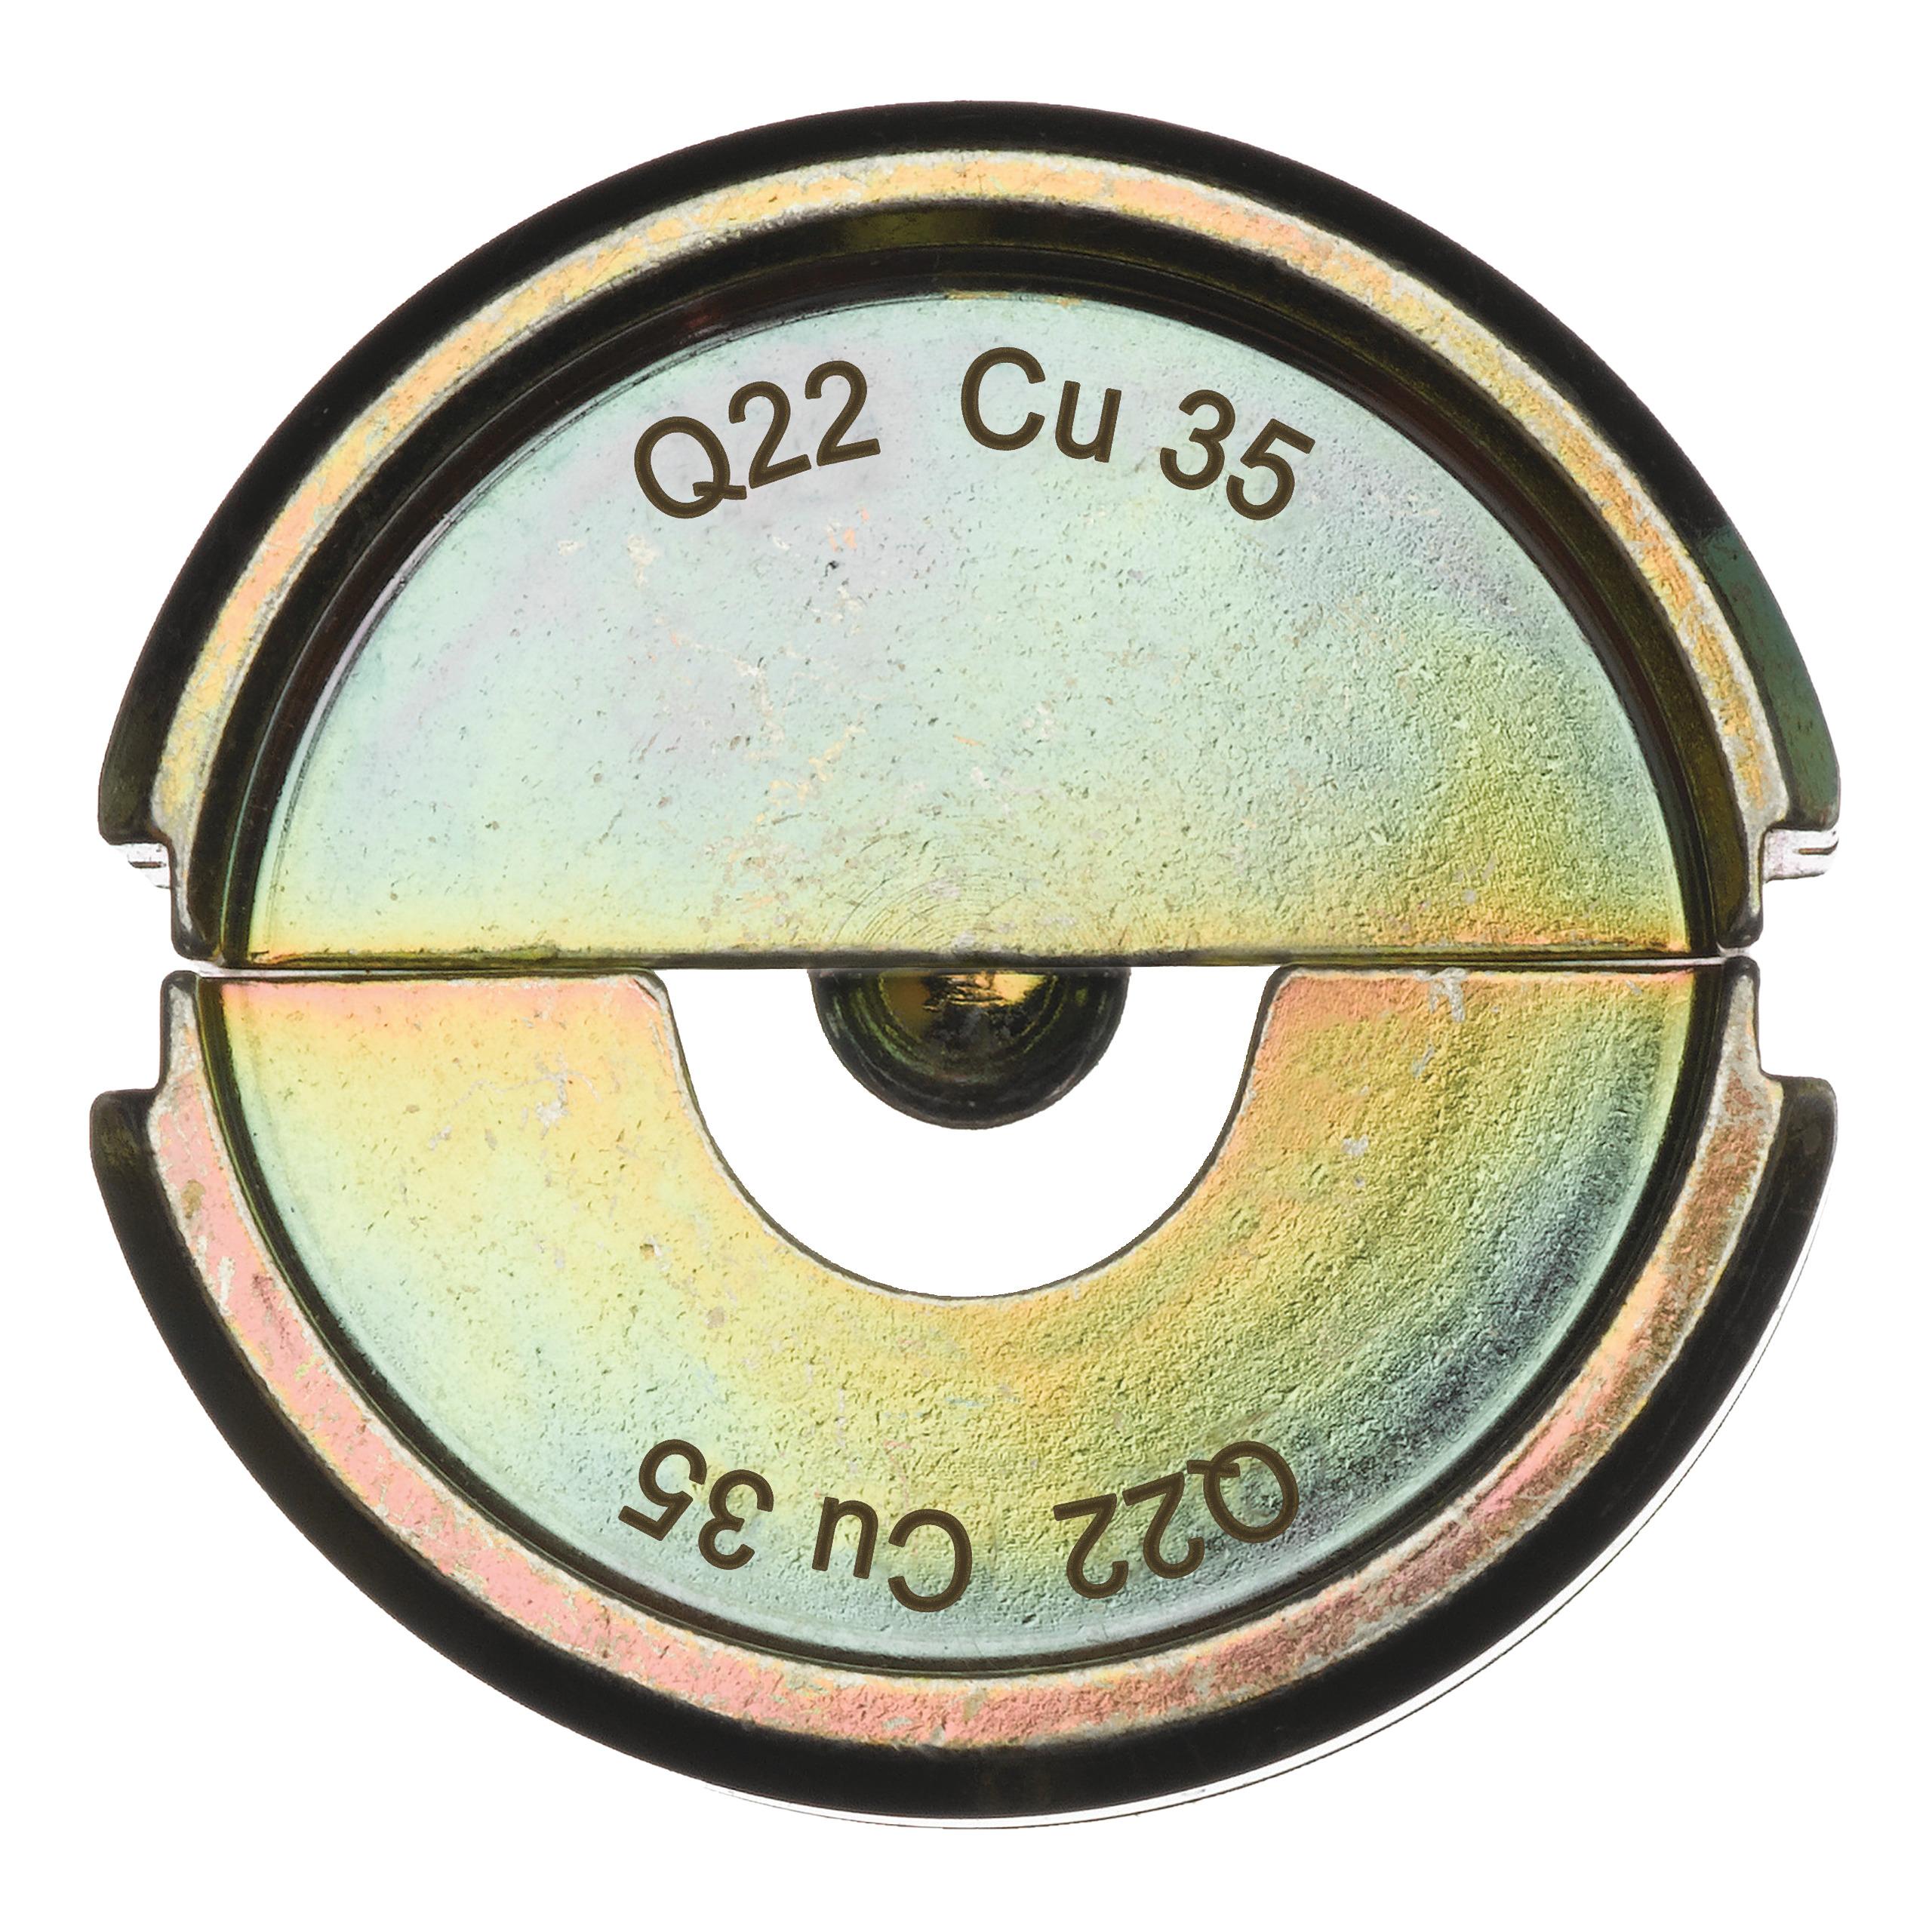 Krimpovací čelisti  Q22 CU 35